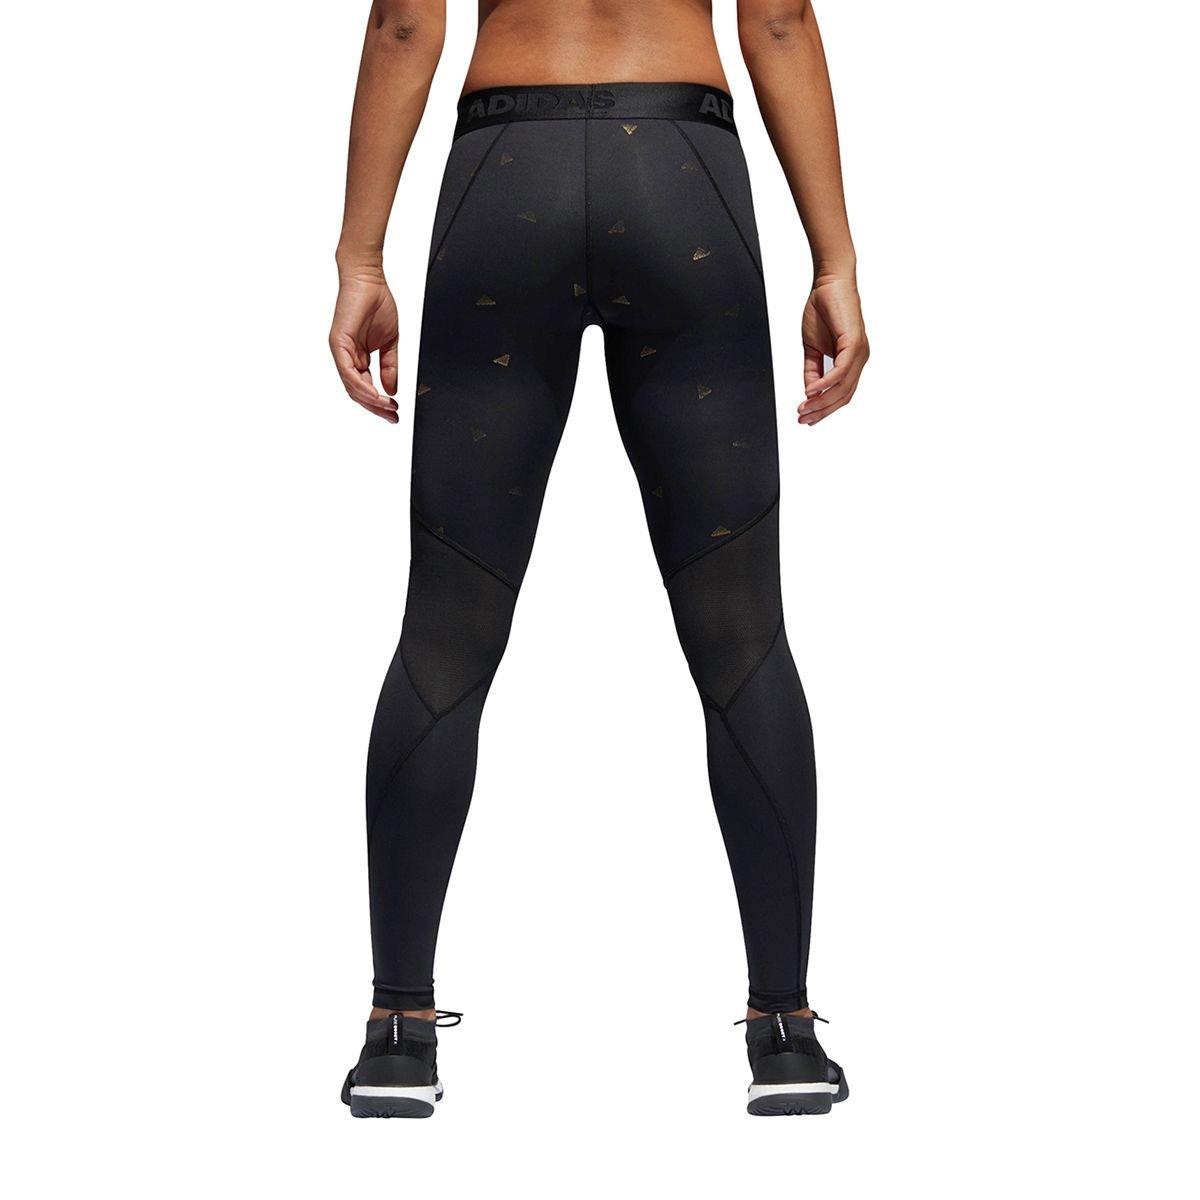 36877eee9cf0 adidas Womens Fitness Yoga Athletic Leggings at Amazon Women s Clothing  store